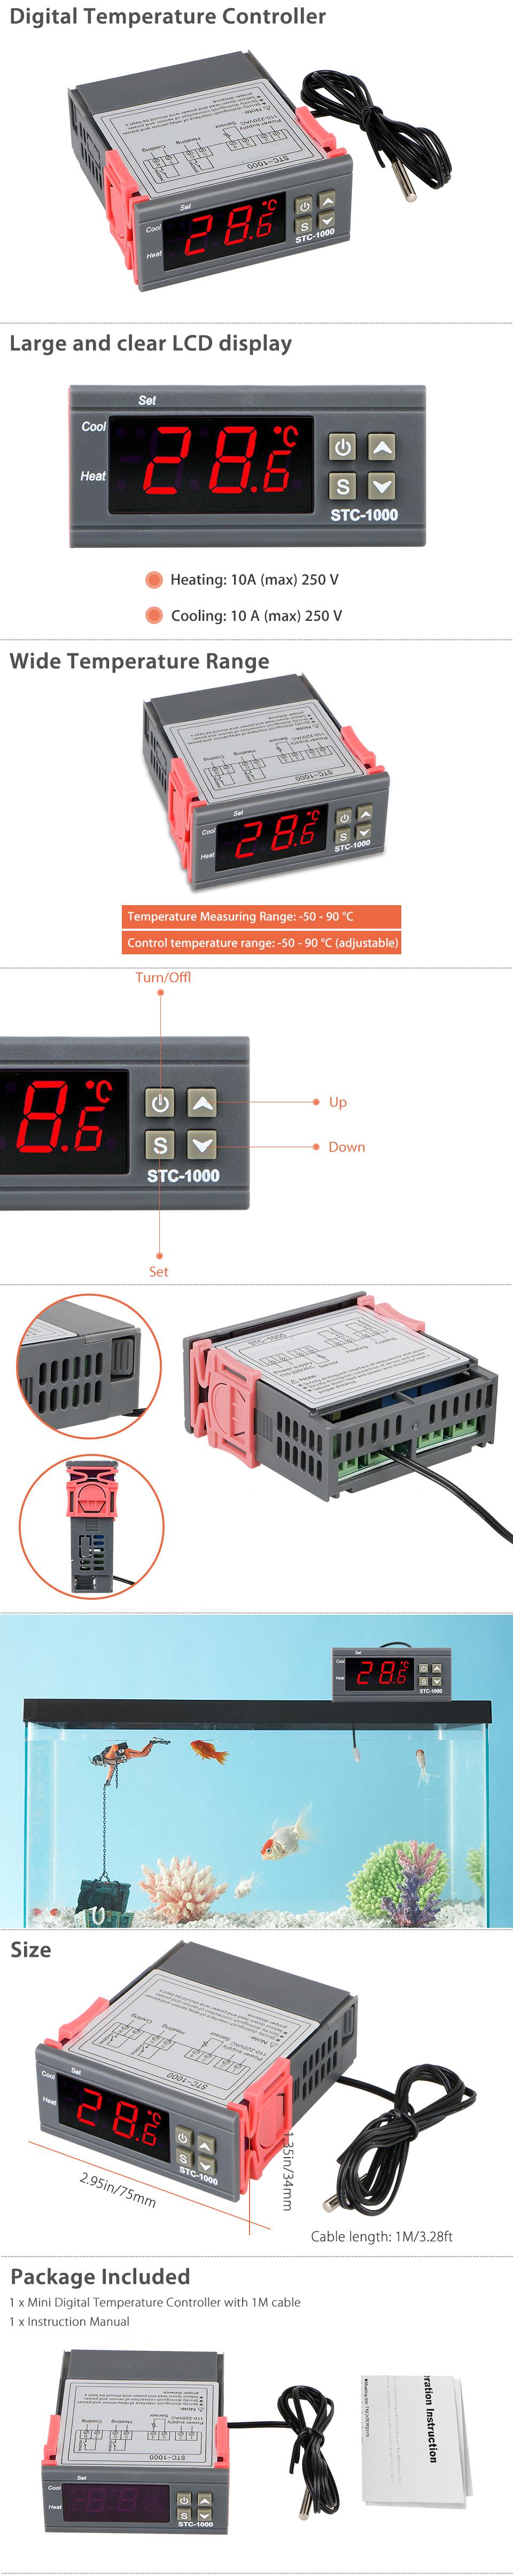 110v 220v Digital Stc 1000 All Purpose Temperature Controller Wiring Diagram Stc1000 Temp Brewing Equipment Gallery Product Description This Mini